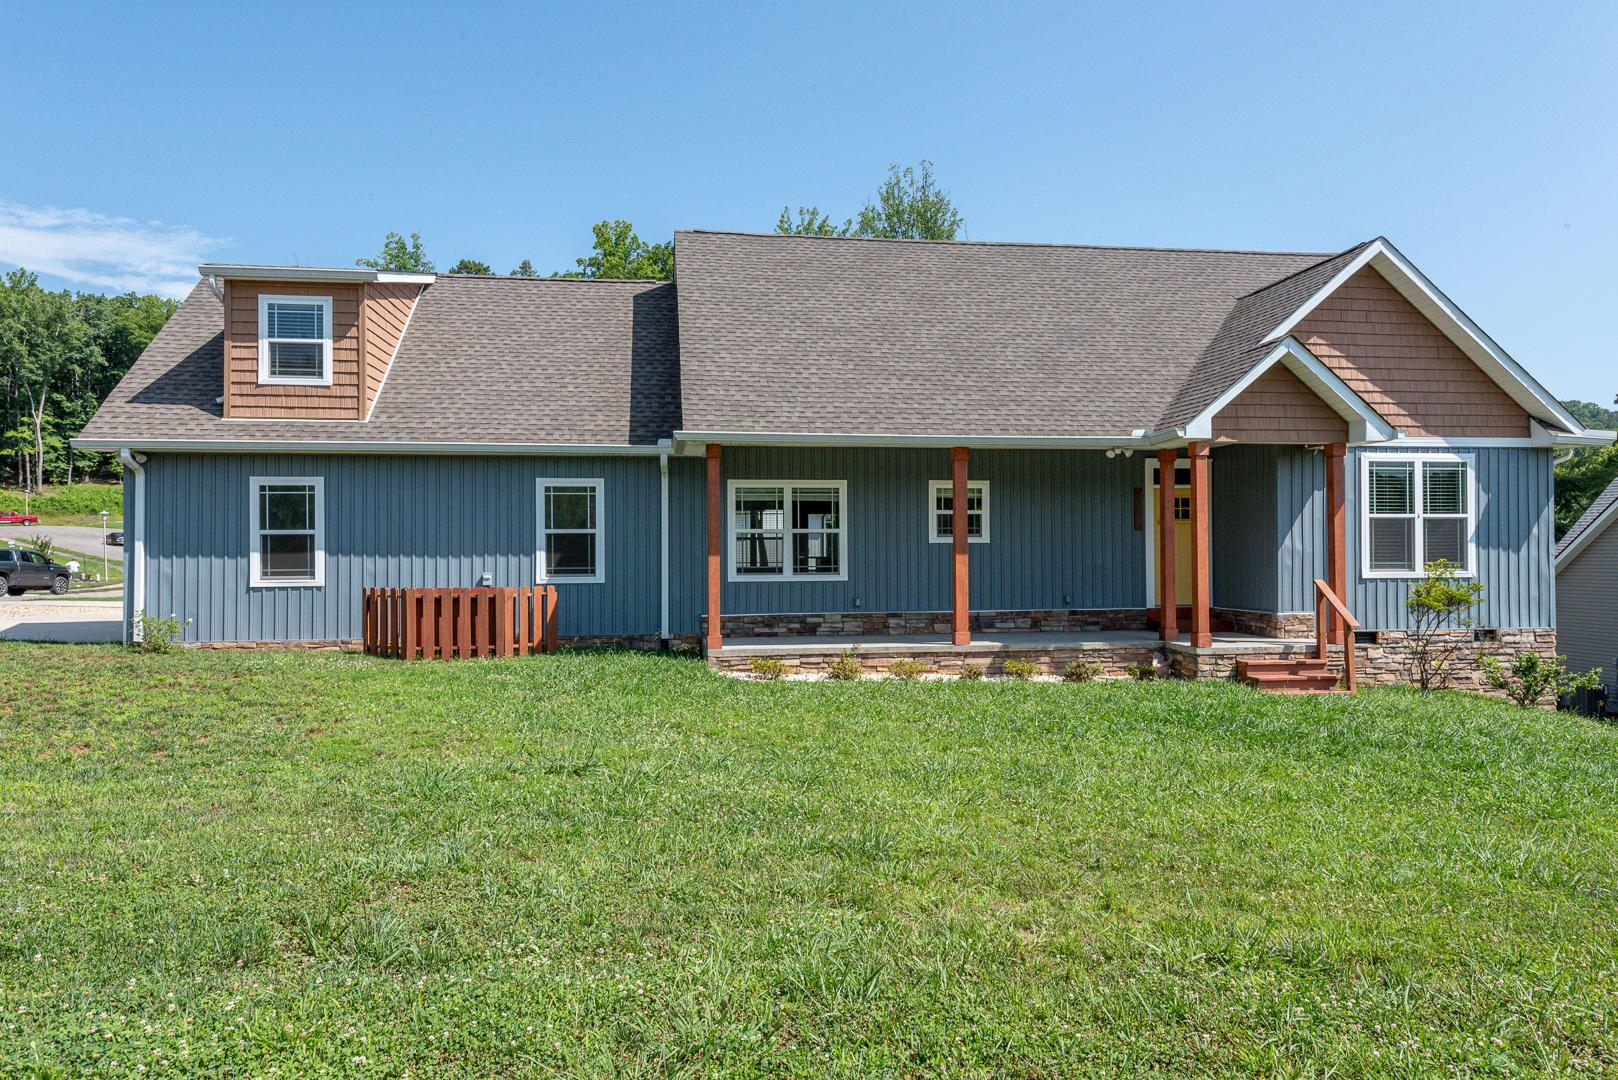 Photo of 200 N Taube Lane, Oak Ridge, TN 37830 (MLS # 1160591)